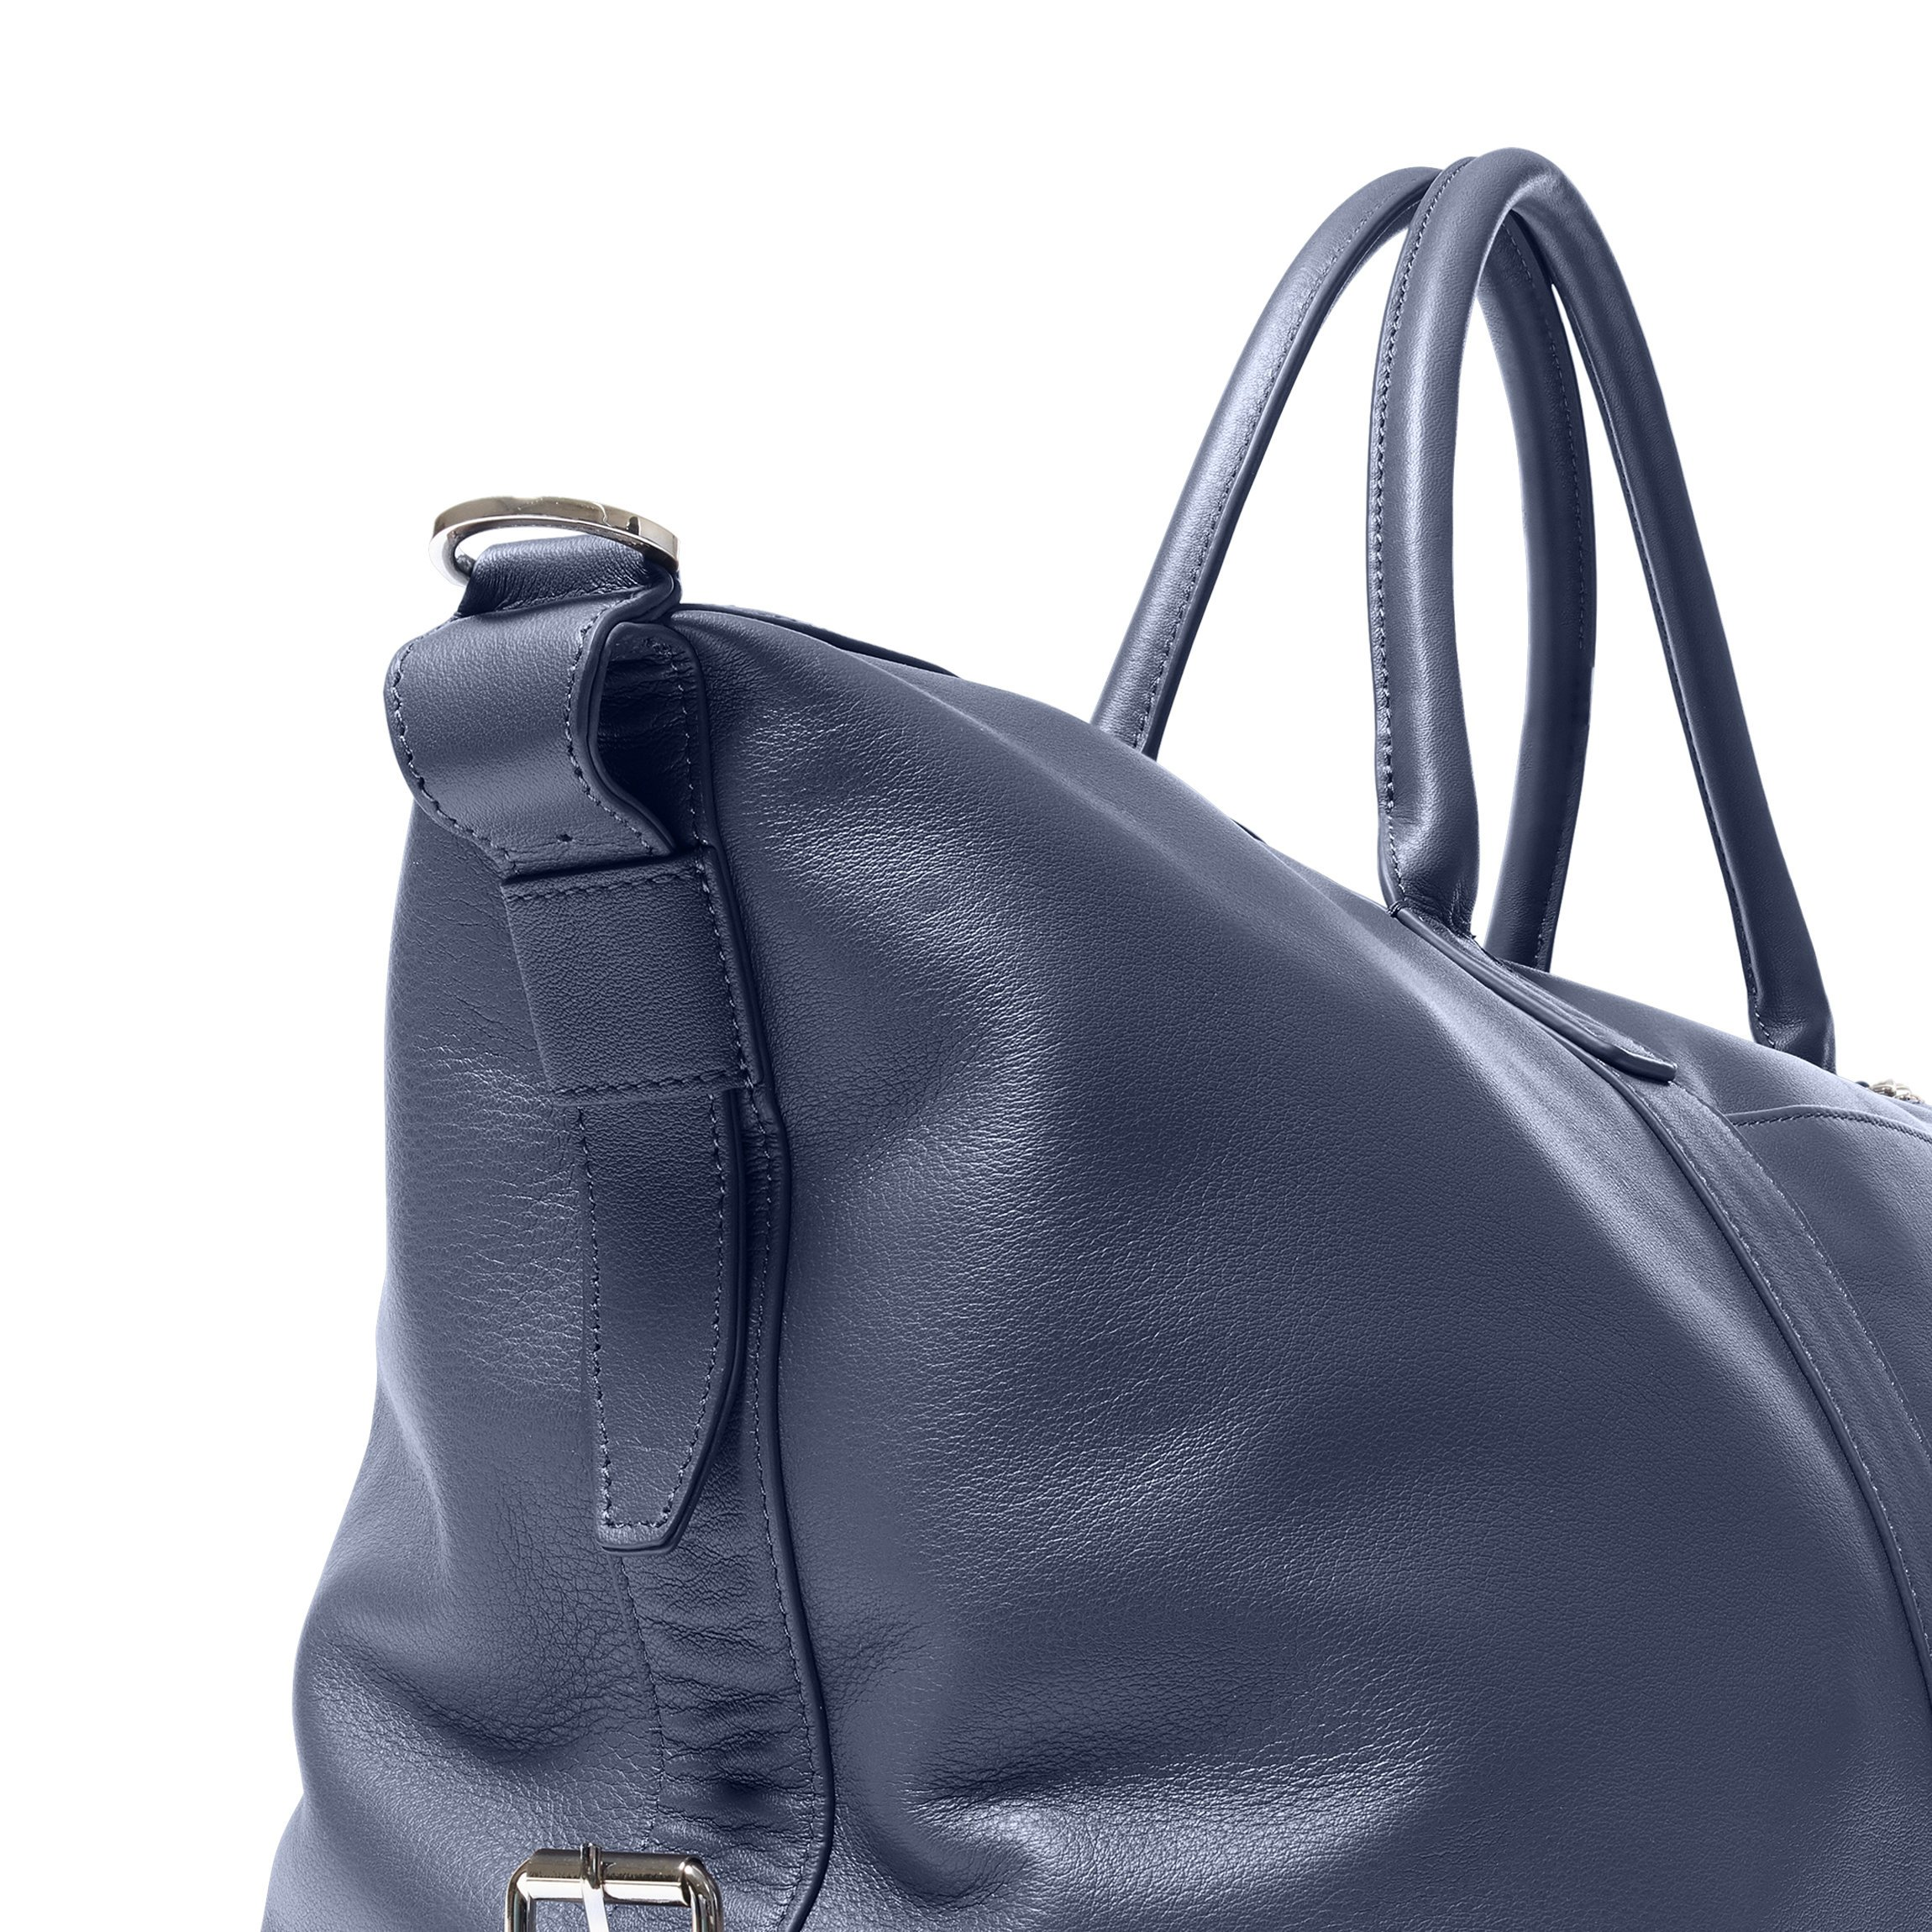 Kessler Medium Duffle - Full Grain Leather Leather - Navy (blue) by Leatherology (Image #4)